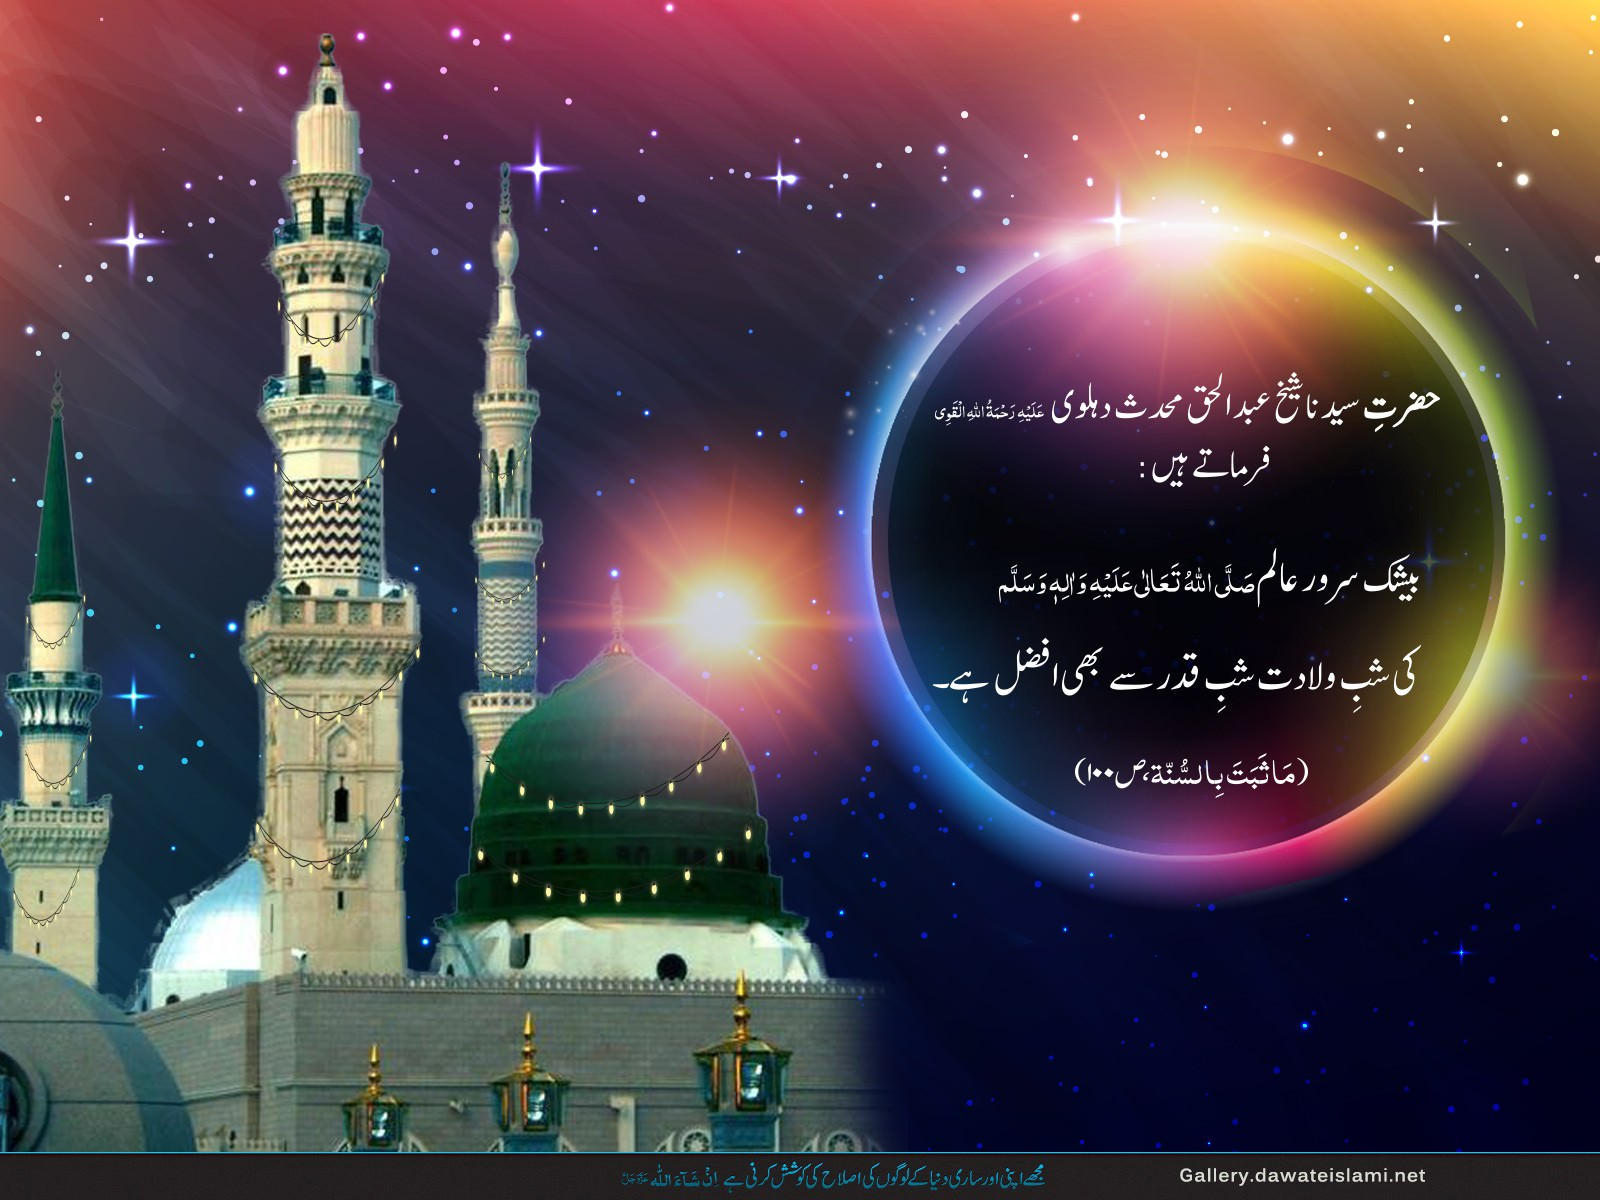 shab e wiladat shab e qadr say bhi afzal- Rabi un noor wallpaper